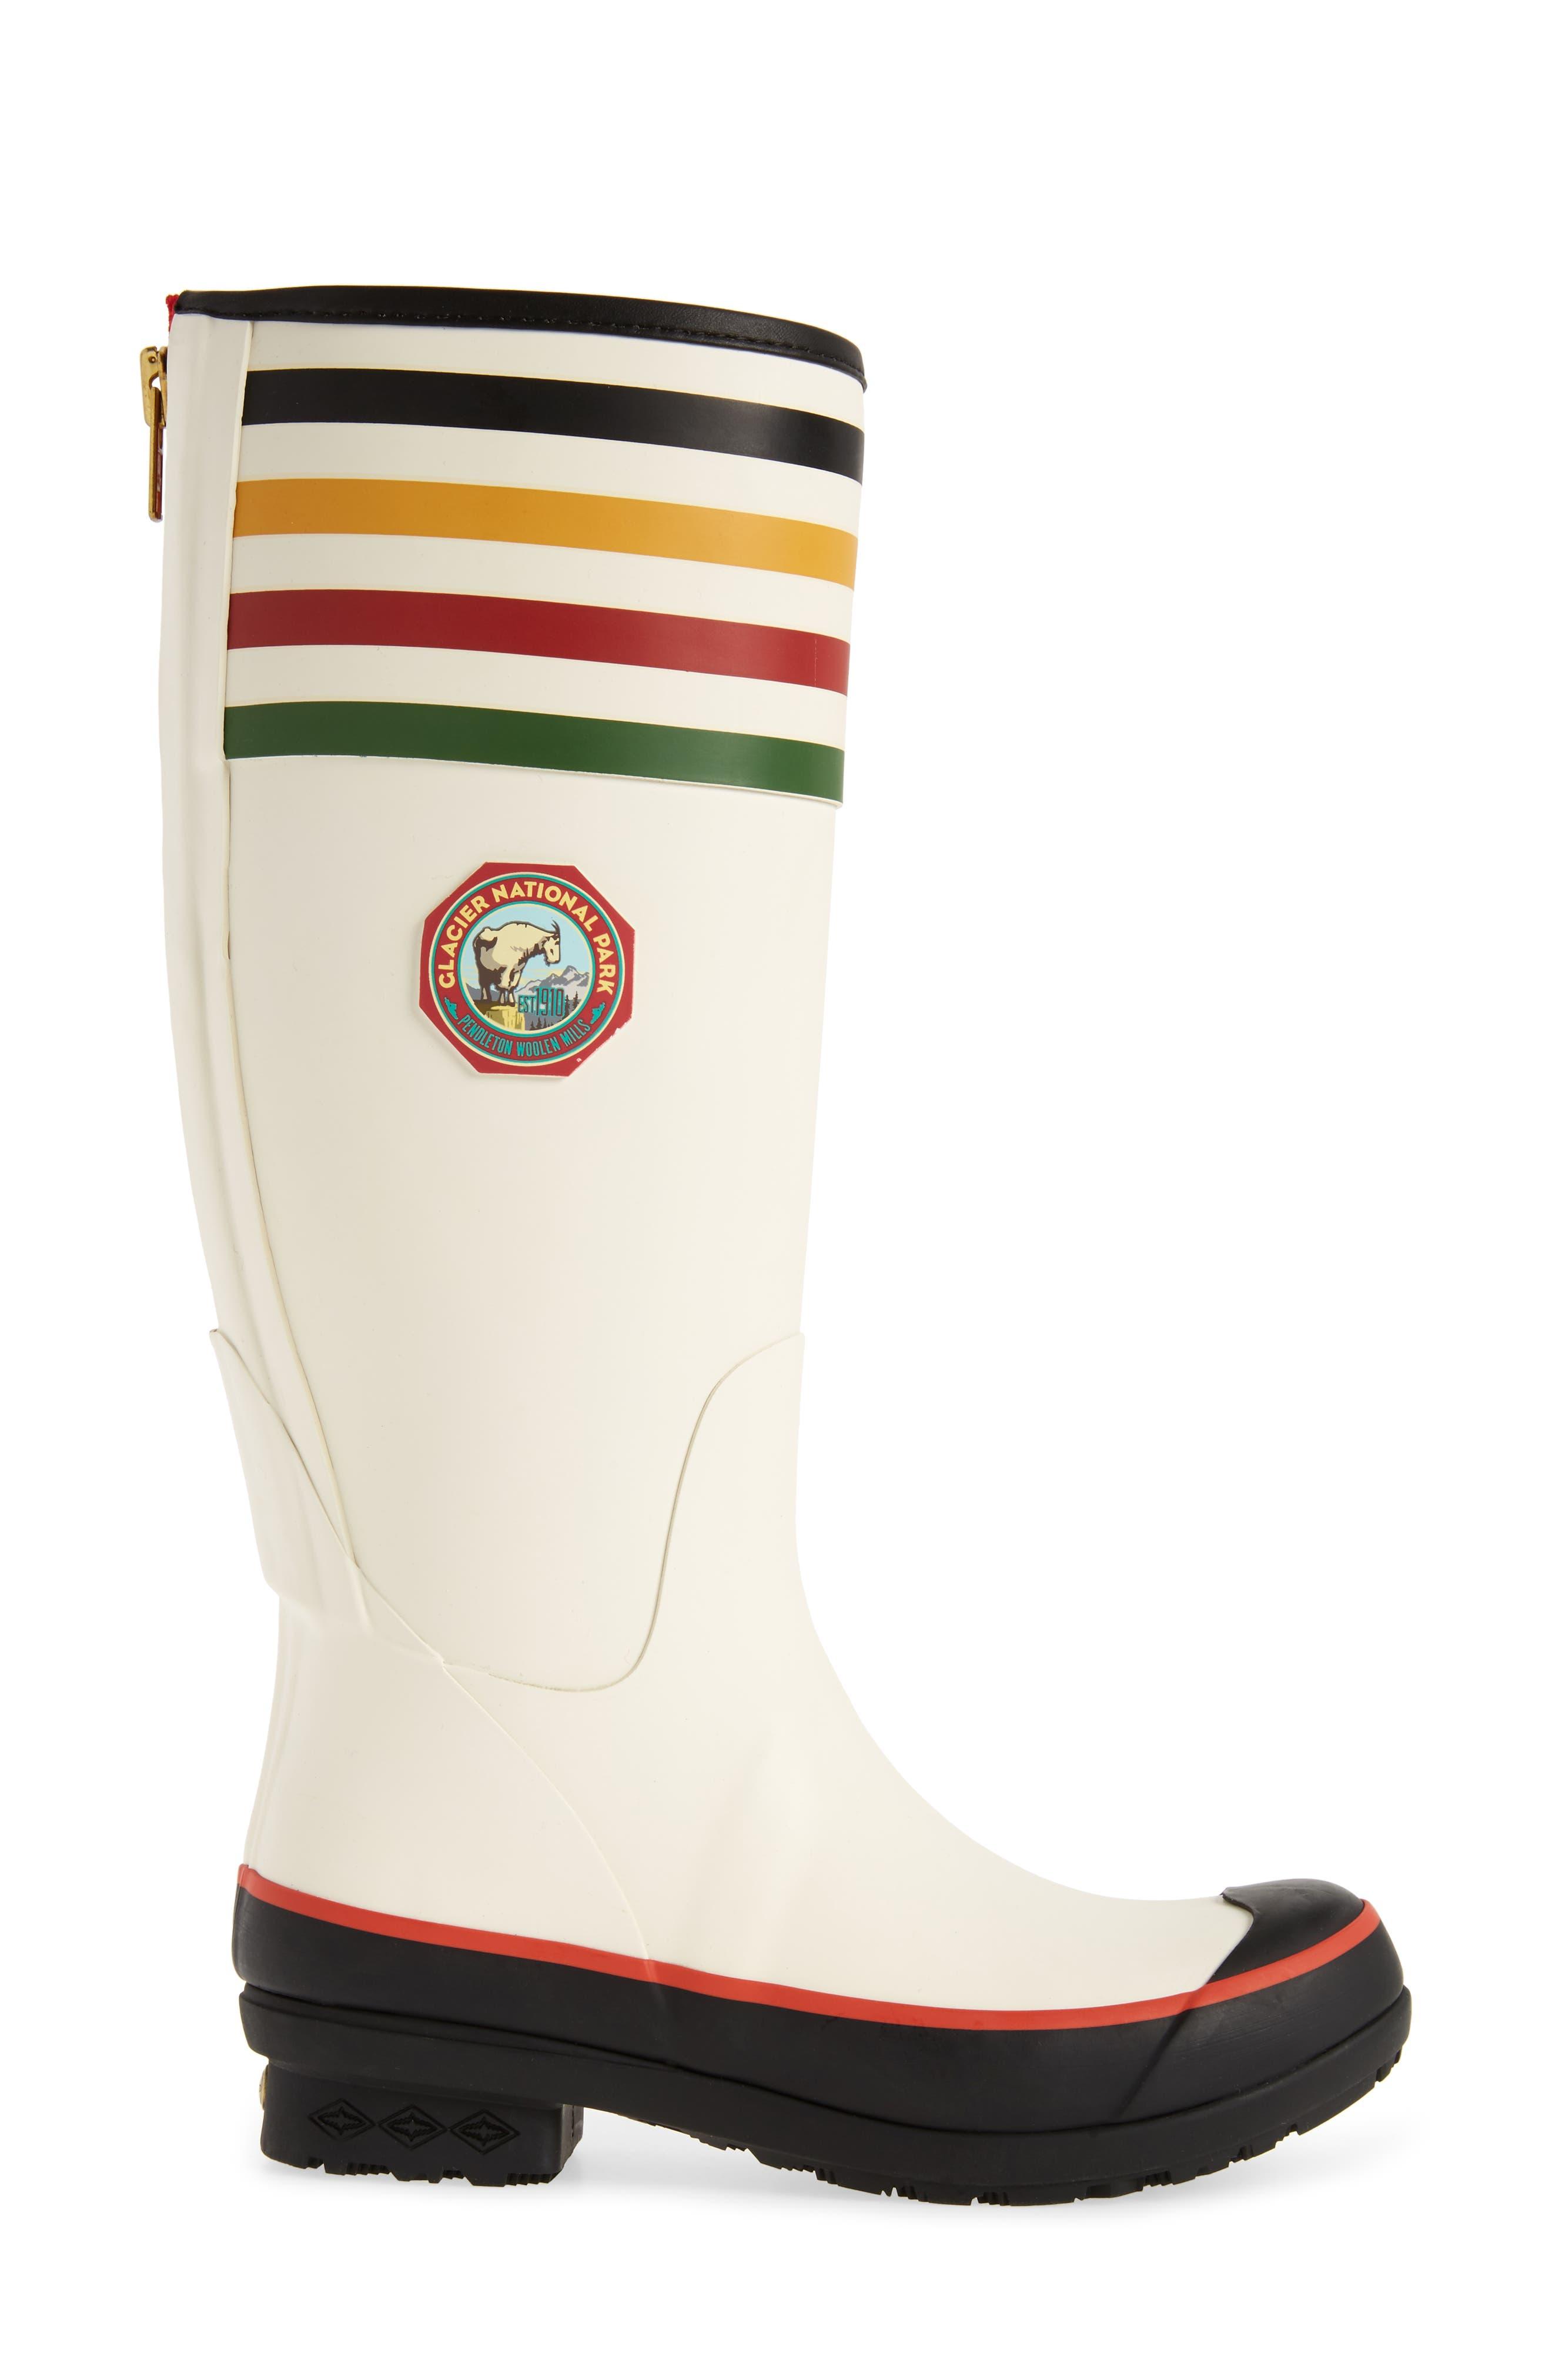 Pendleton Glacier National Park Tall Rain Boot,                             Alternate thumbnail 3, color,                             White